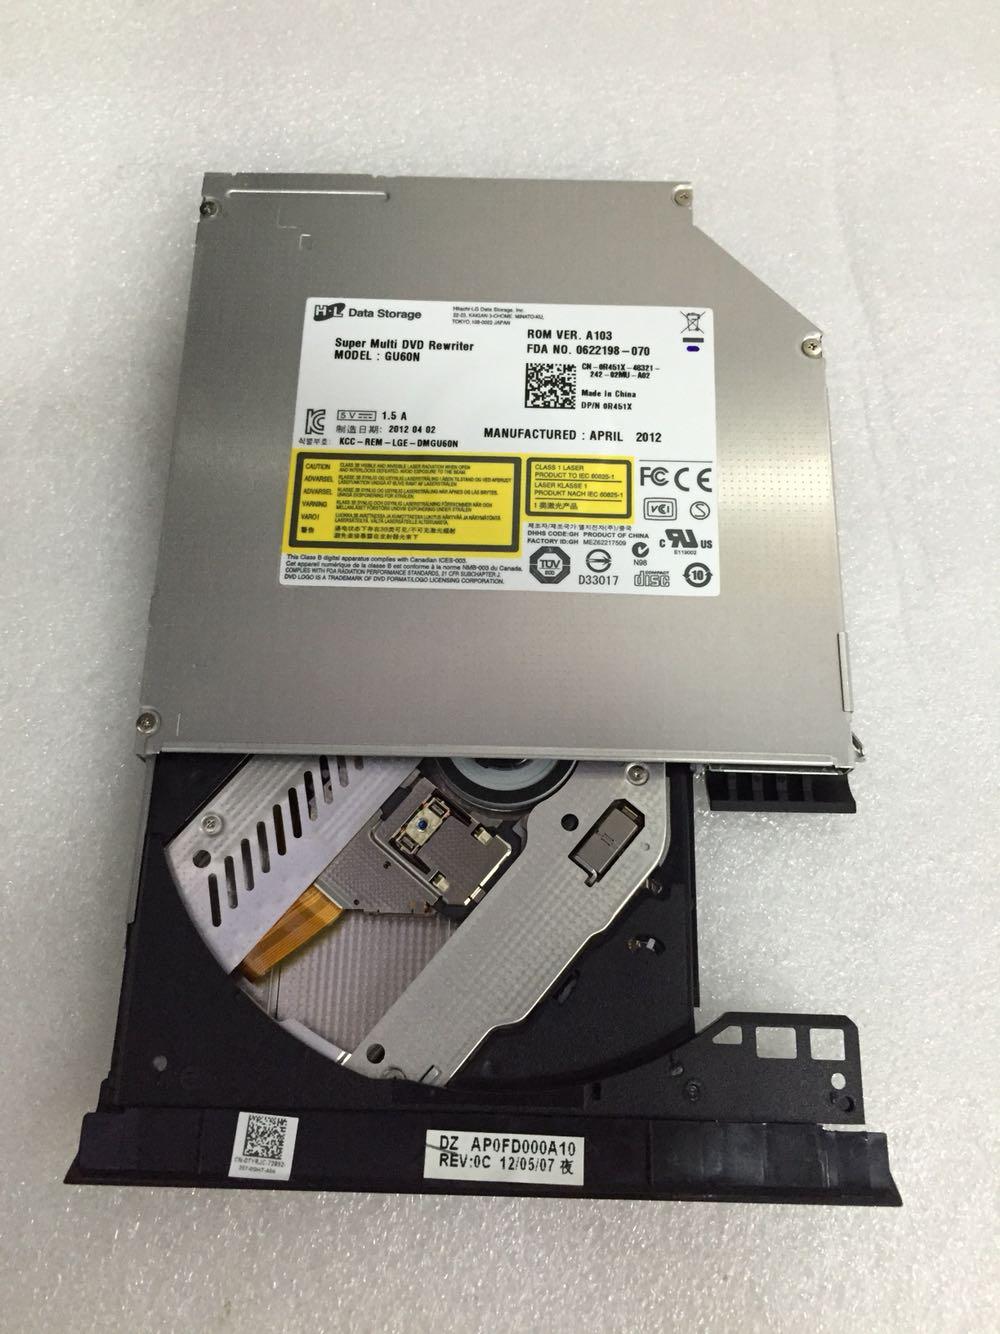 Диск для записи DVD-дисков Dell Latitude E6320 E6330 E6420 E6430 E6520 E6530